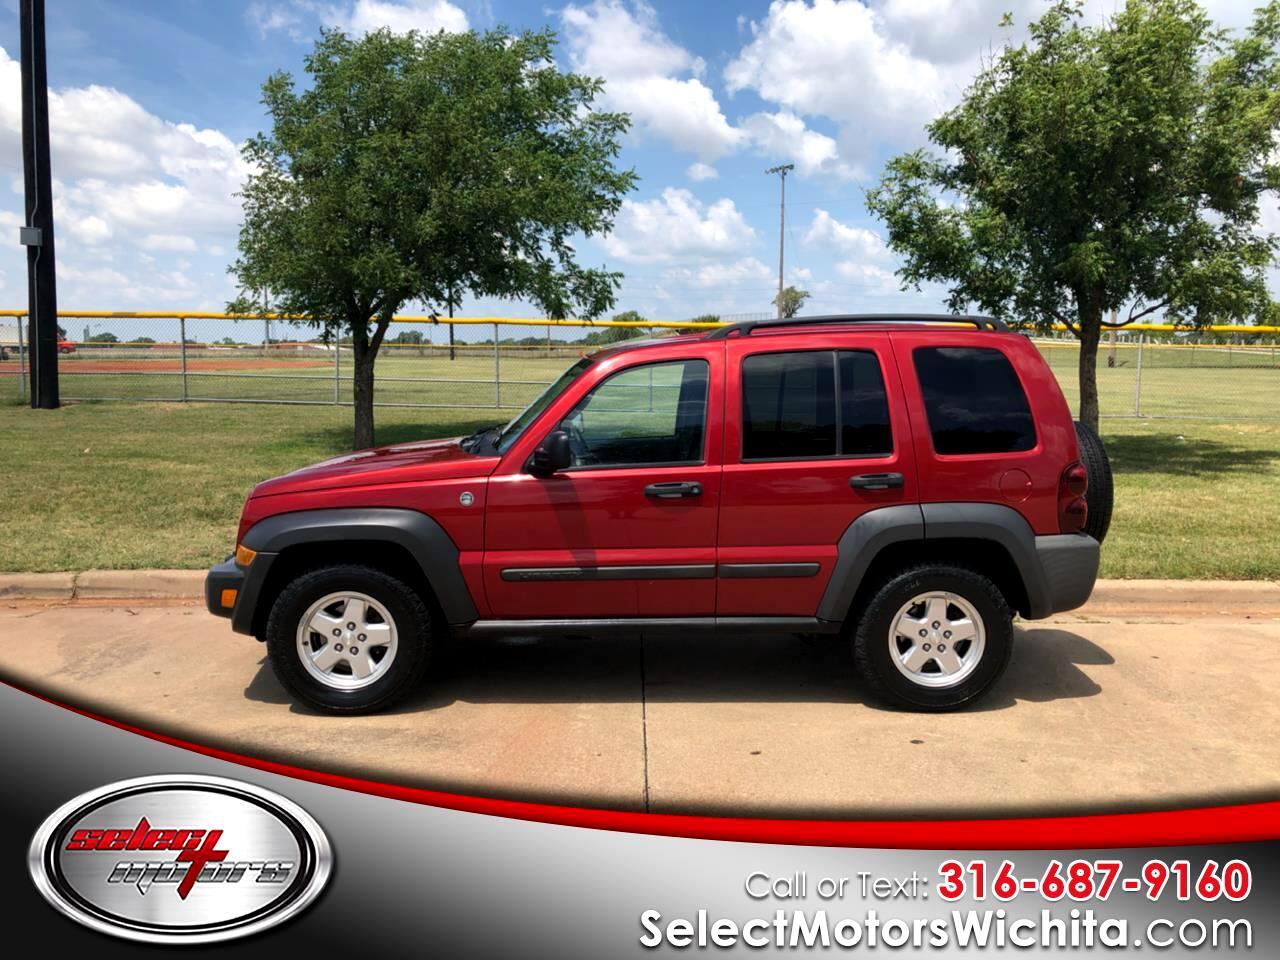 2006 Jeep Liberty 4dr Sport 4WD